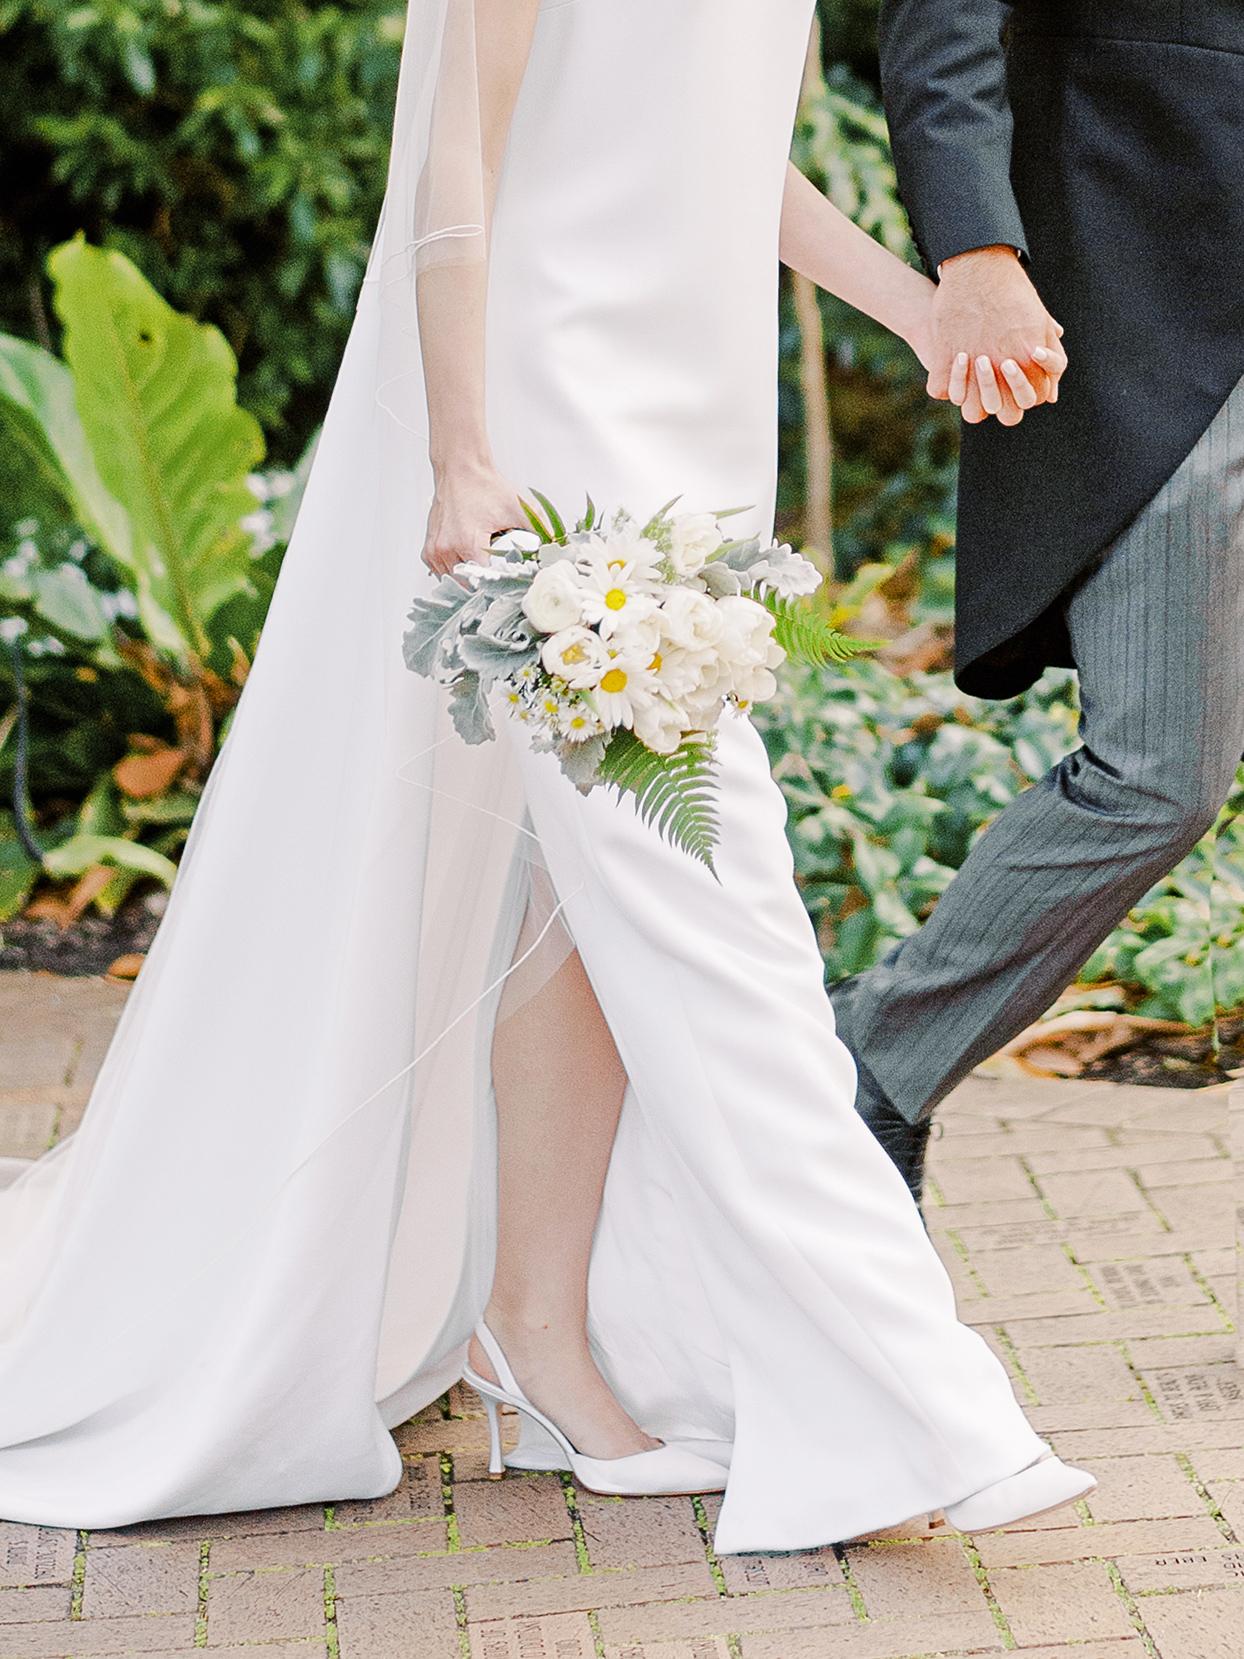 sofia alberto wedding bouquet